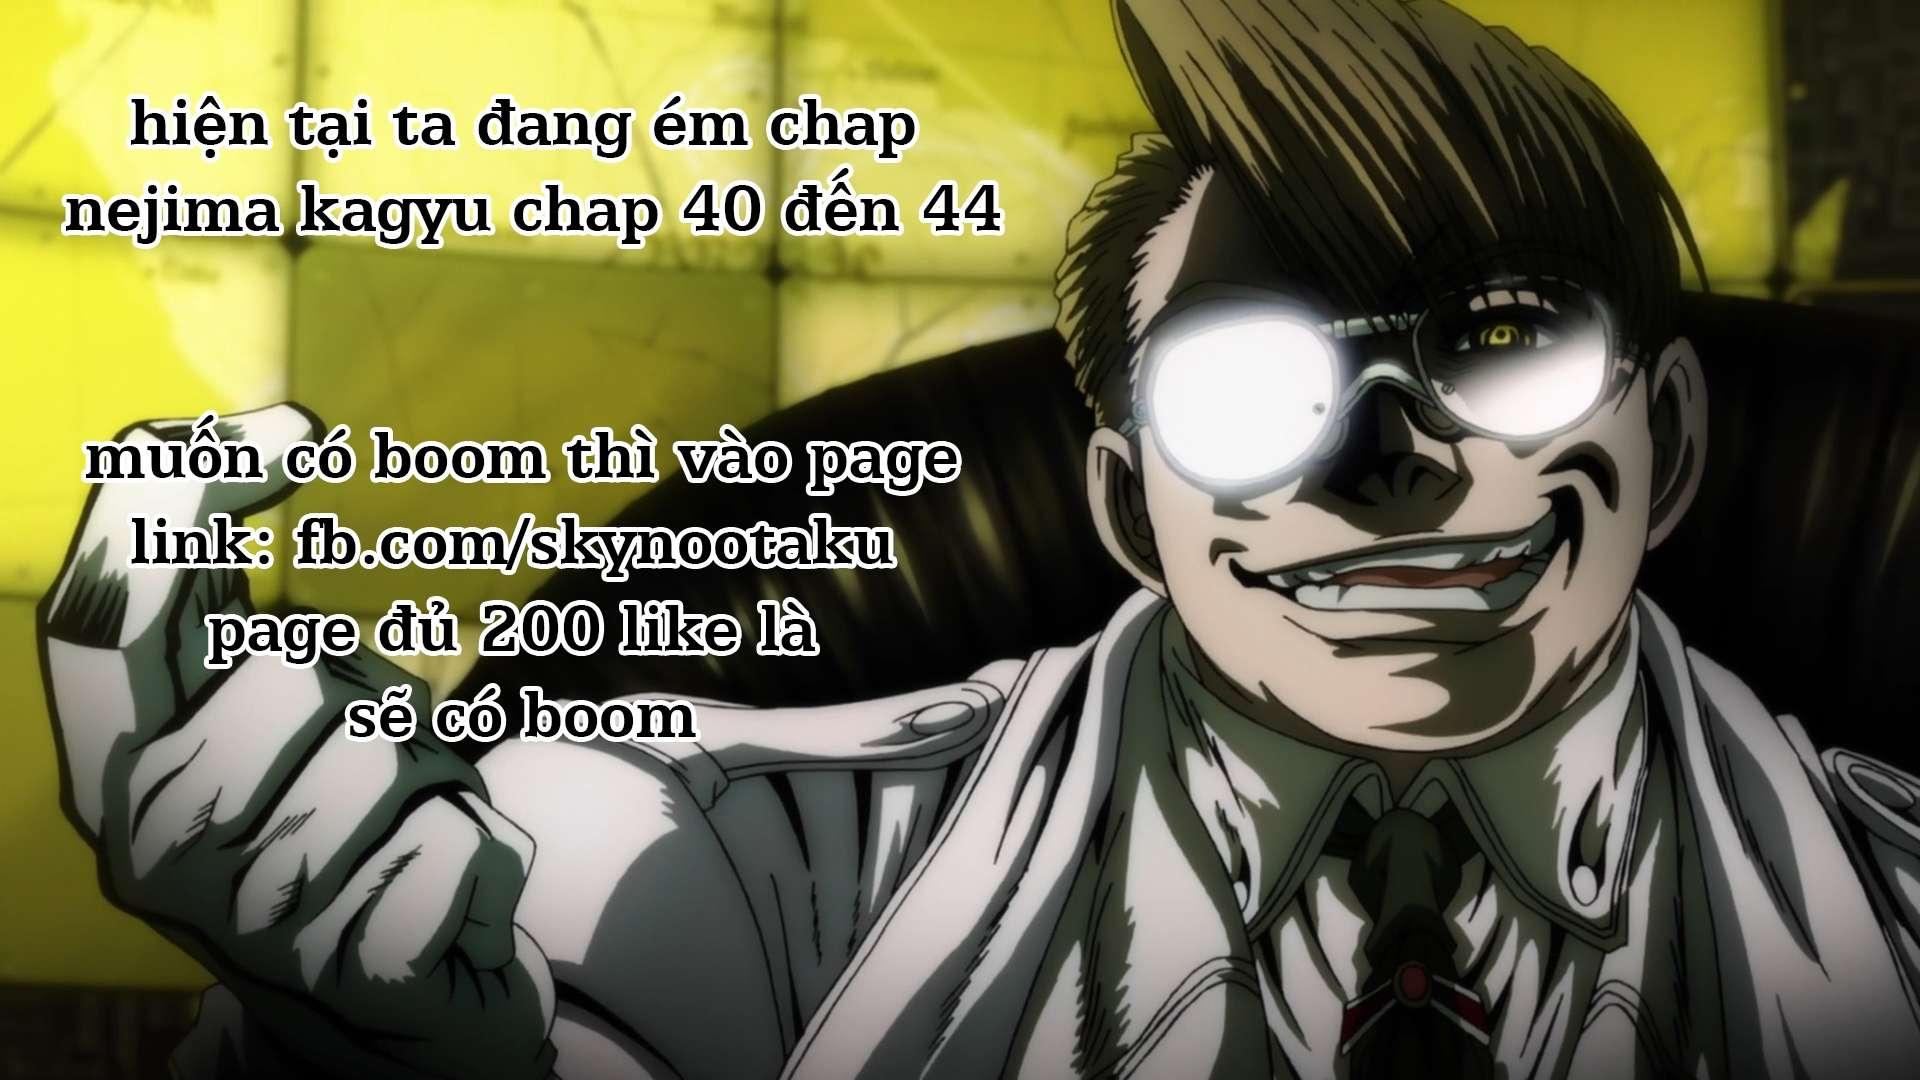 Nejimaki Kagyuu Chap 38 - Next Chap 39